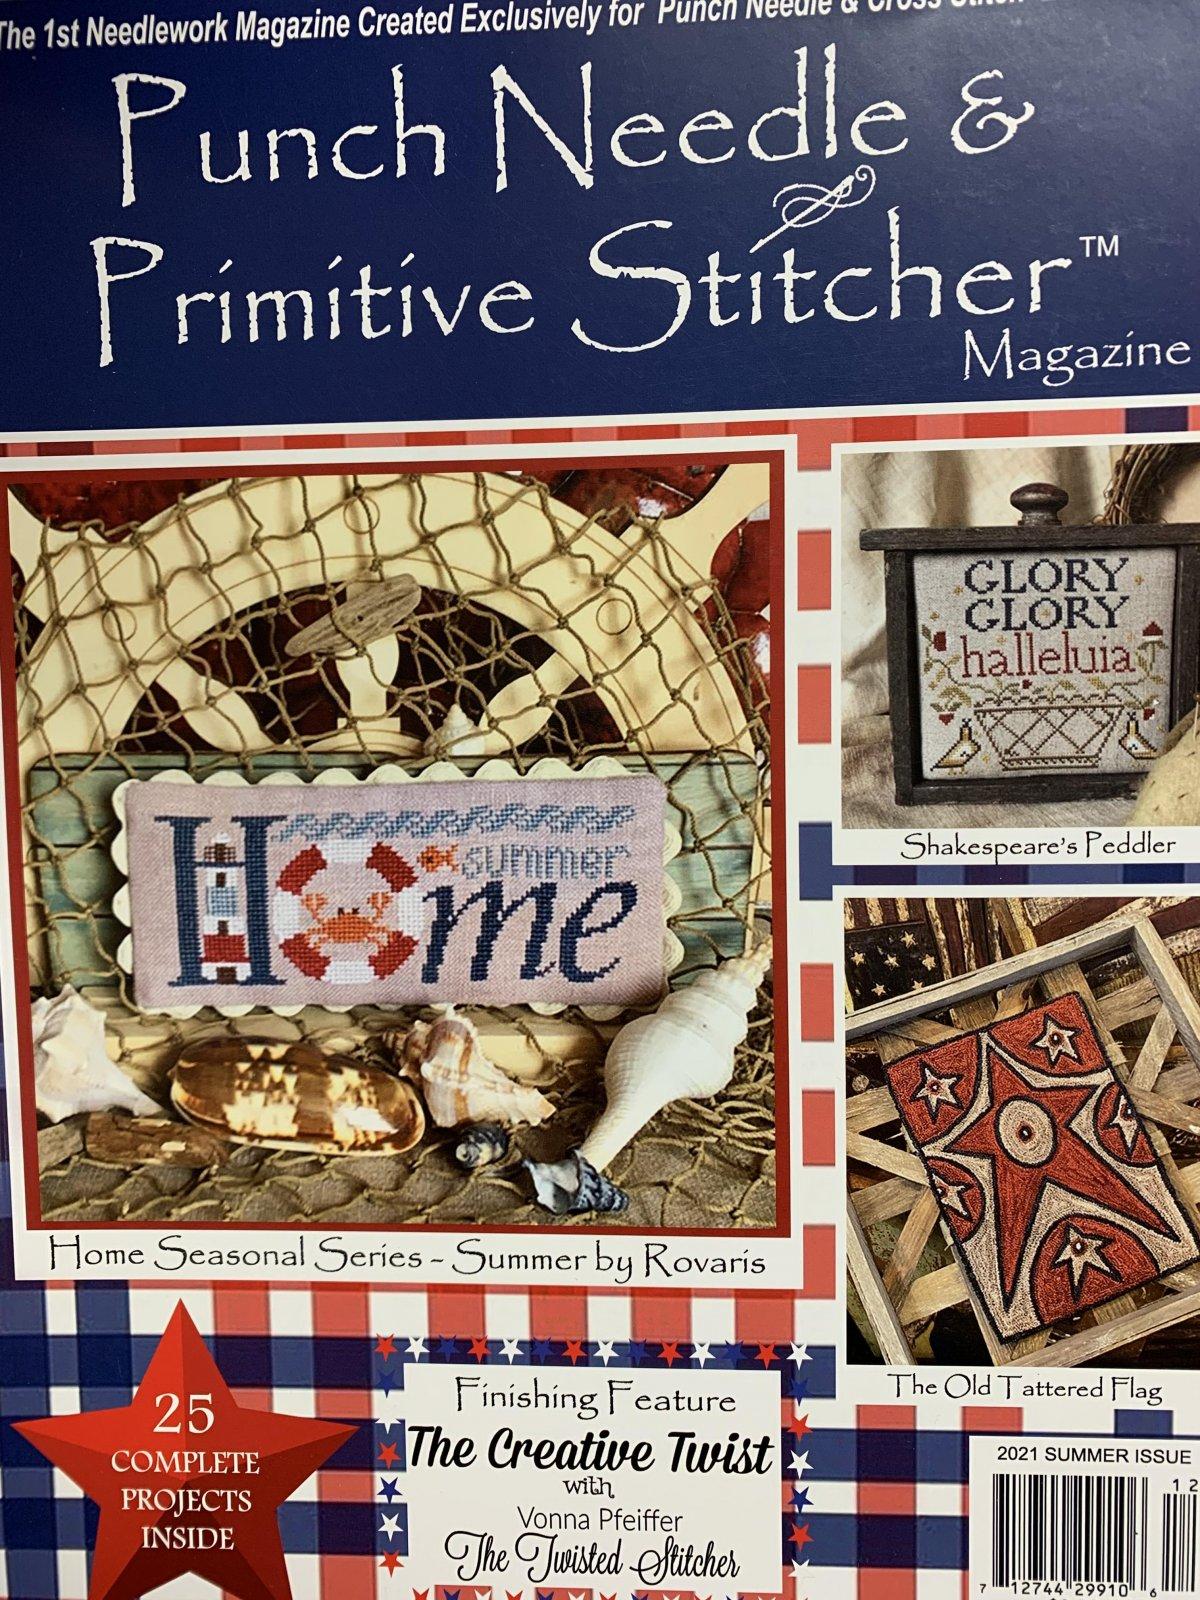 Punch Needle & Primitive Stitcher  Summer 2021 magazine